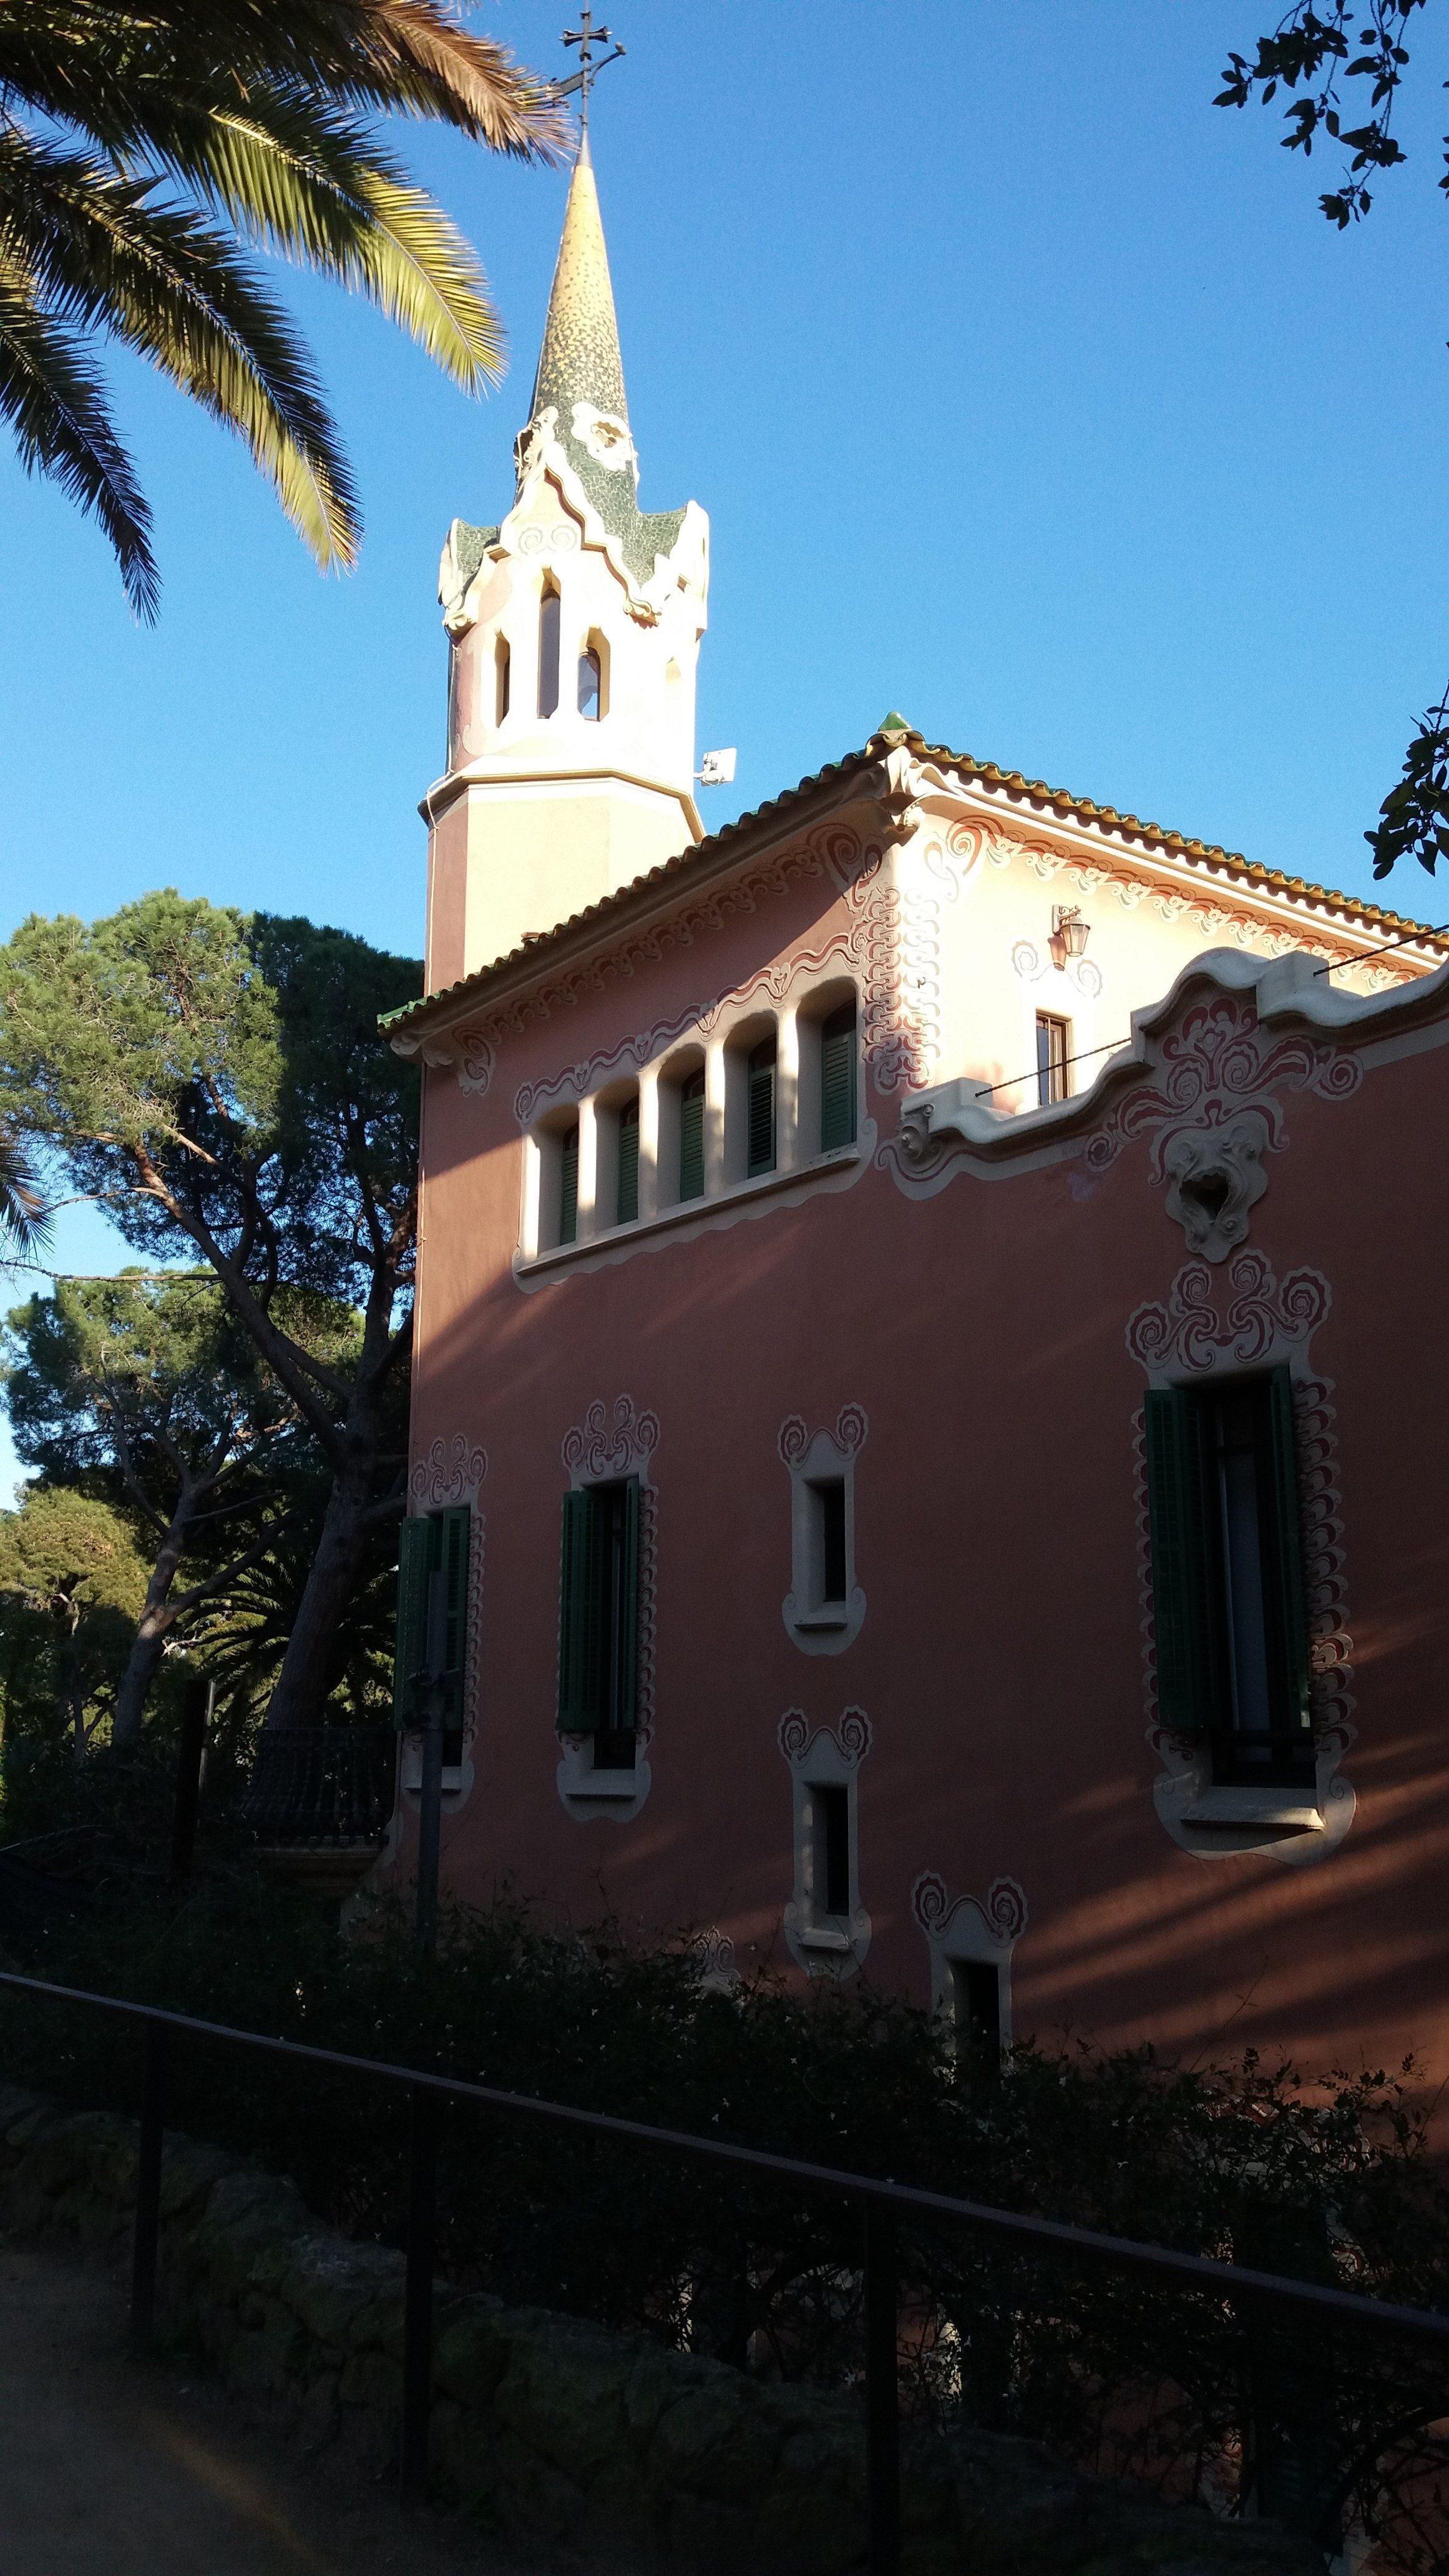 Casa Museo Gaudi.La Casa Museo Gaudi Lycee Gabriel Touchard Washington